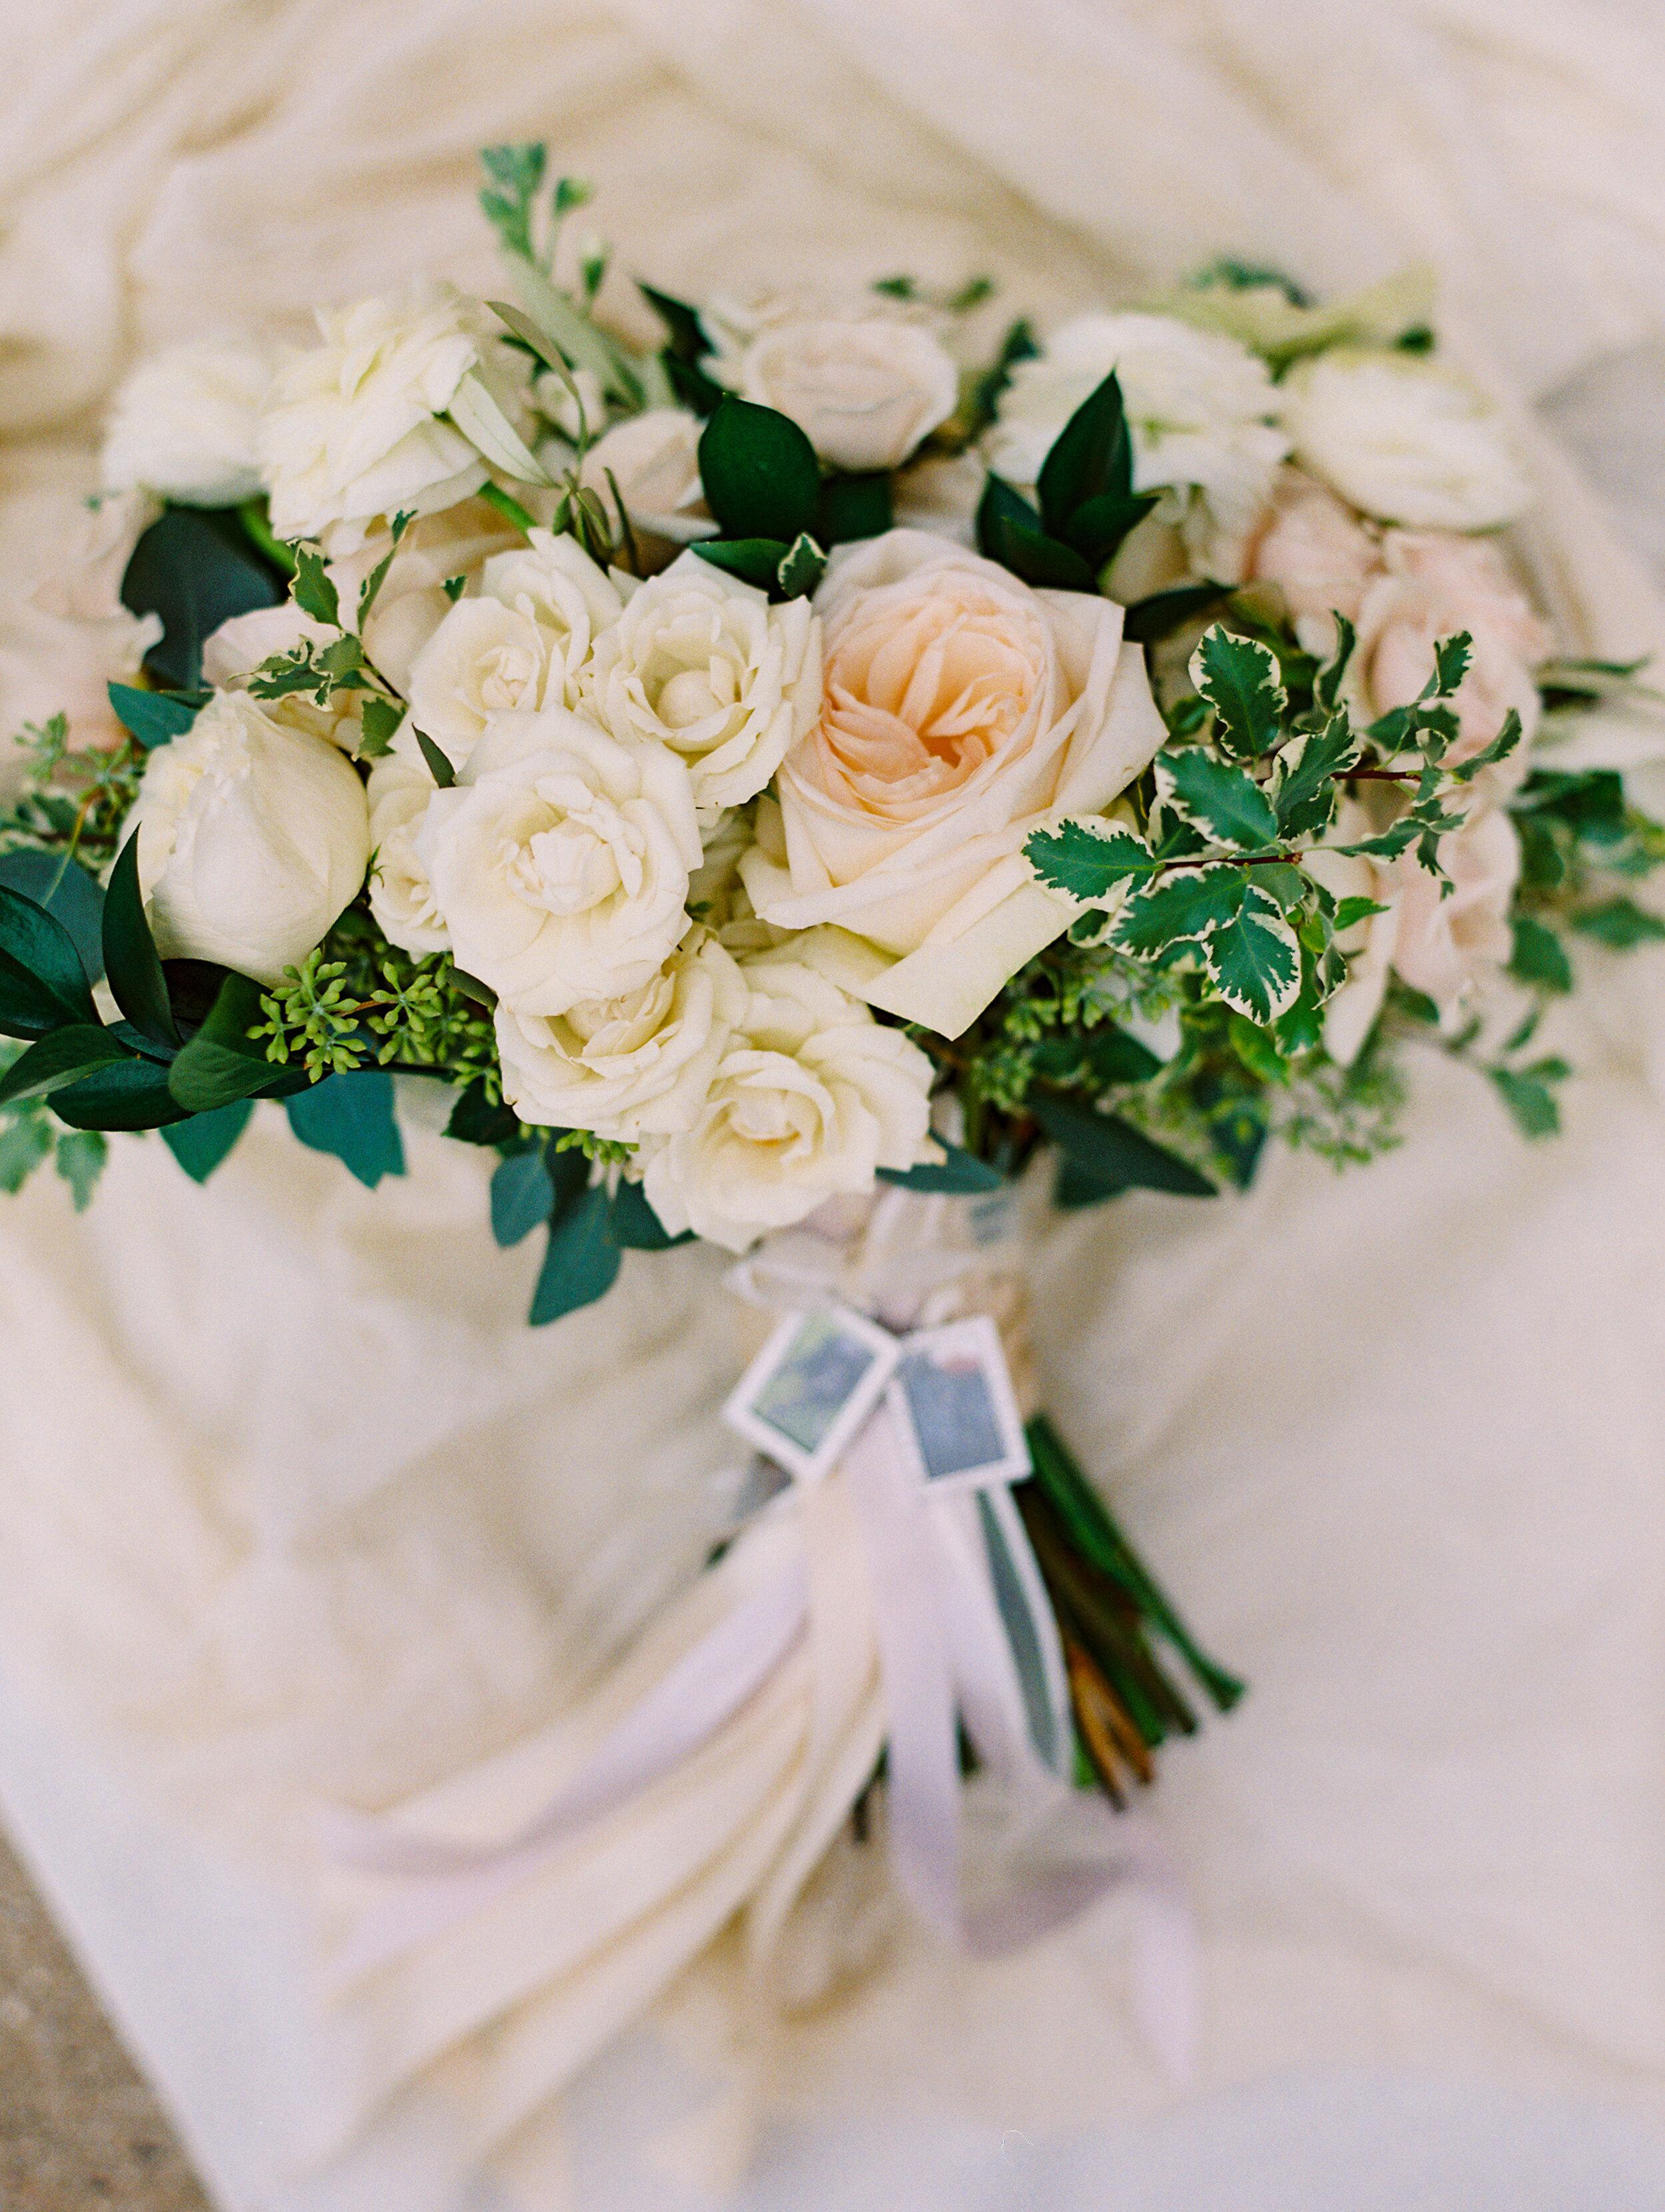 Kuiper+Wedding+Details-60.jpg